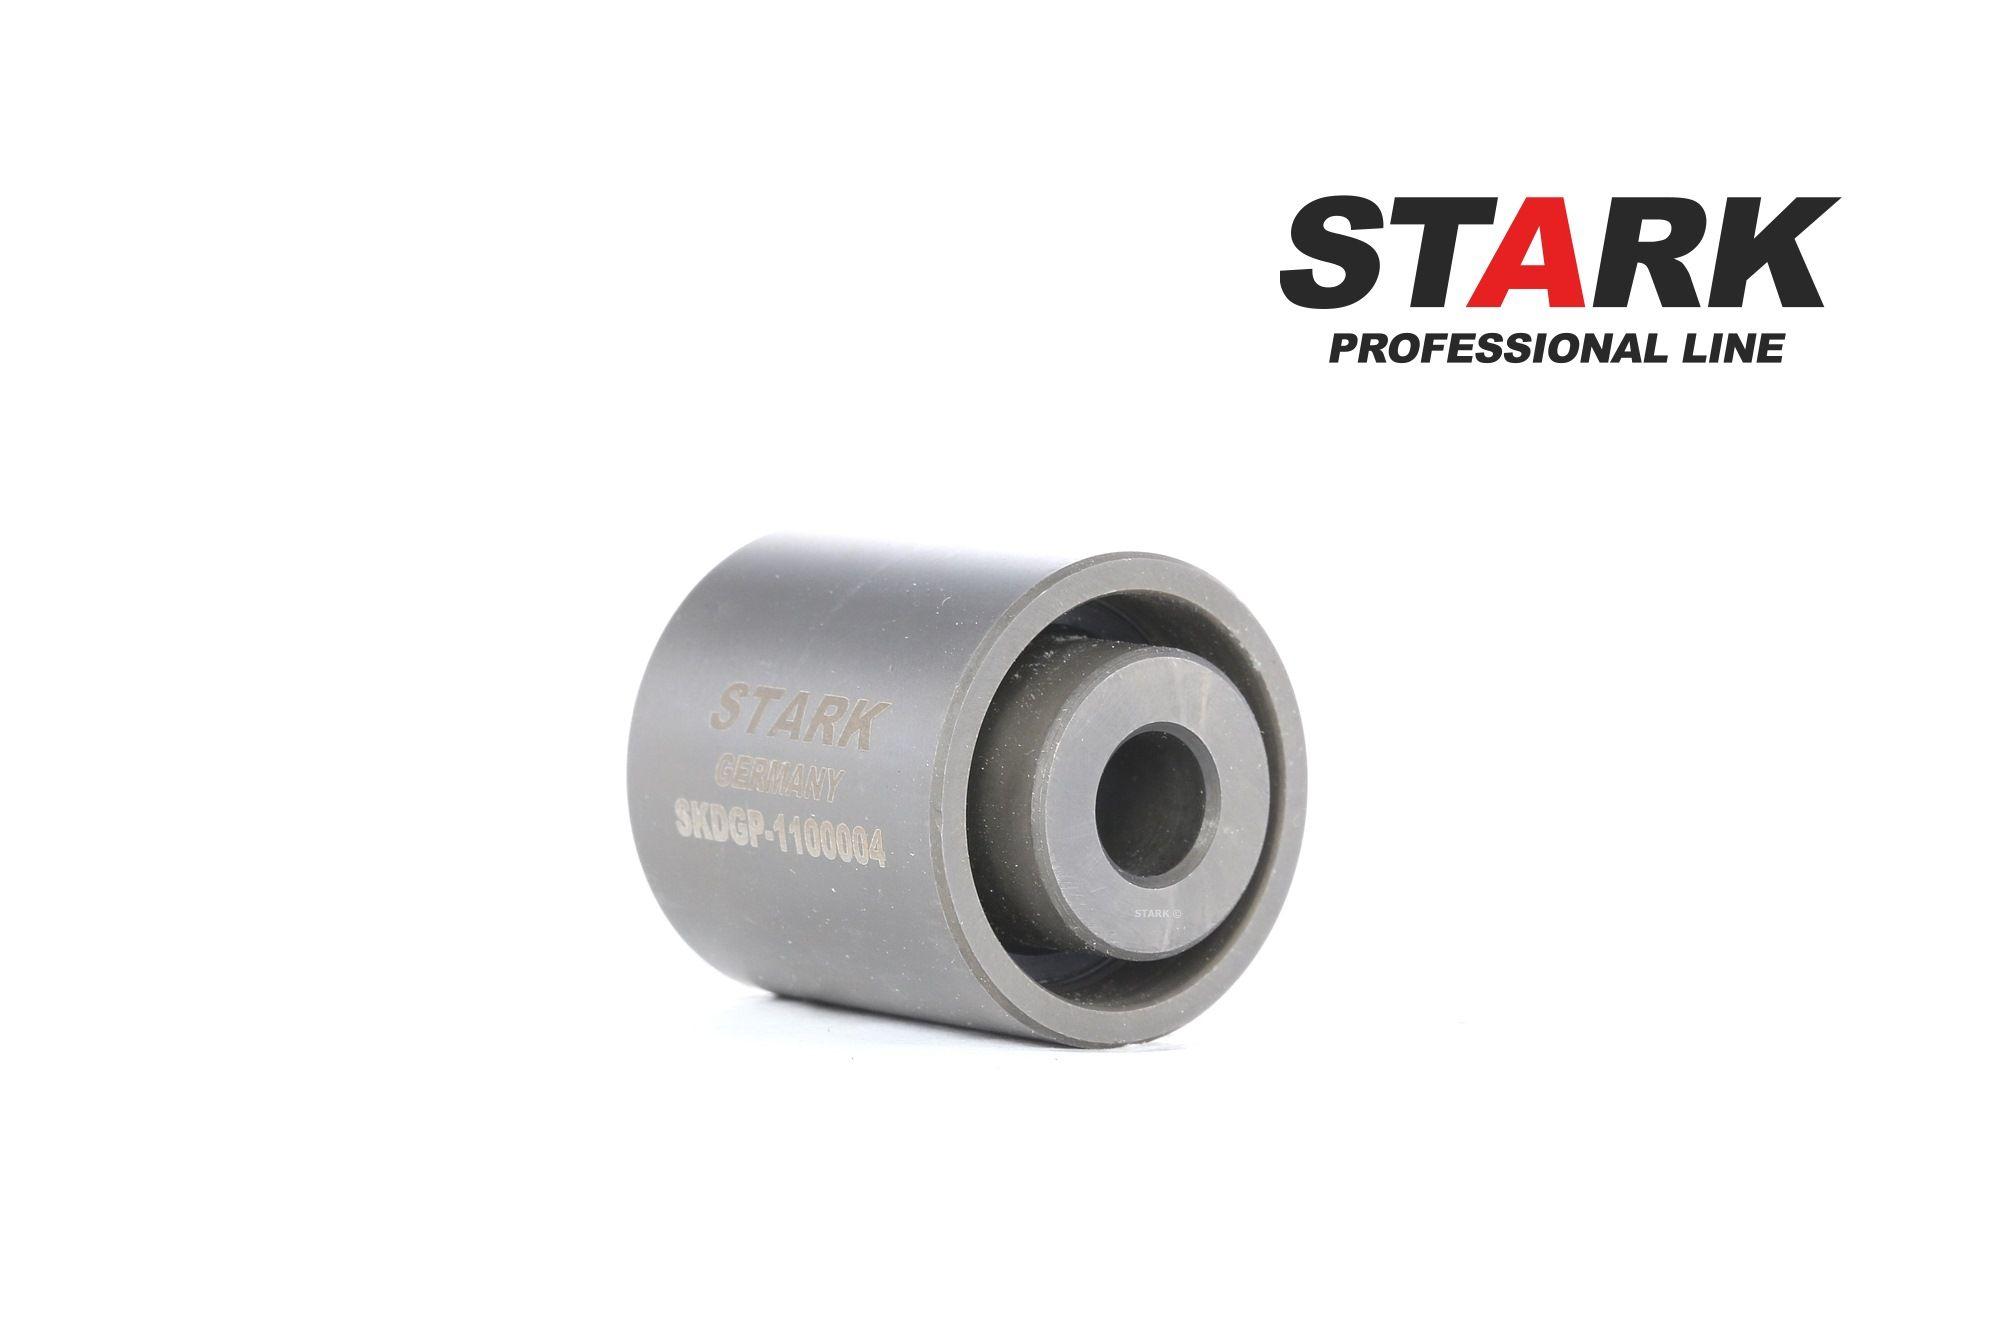 Umlenkrolle Zahnriemen STARK SKDGP-1100004 Bewertung